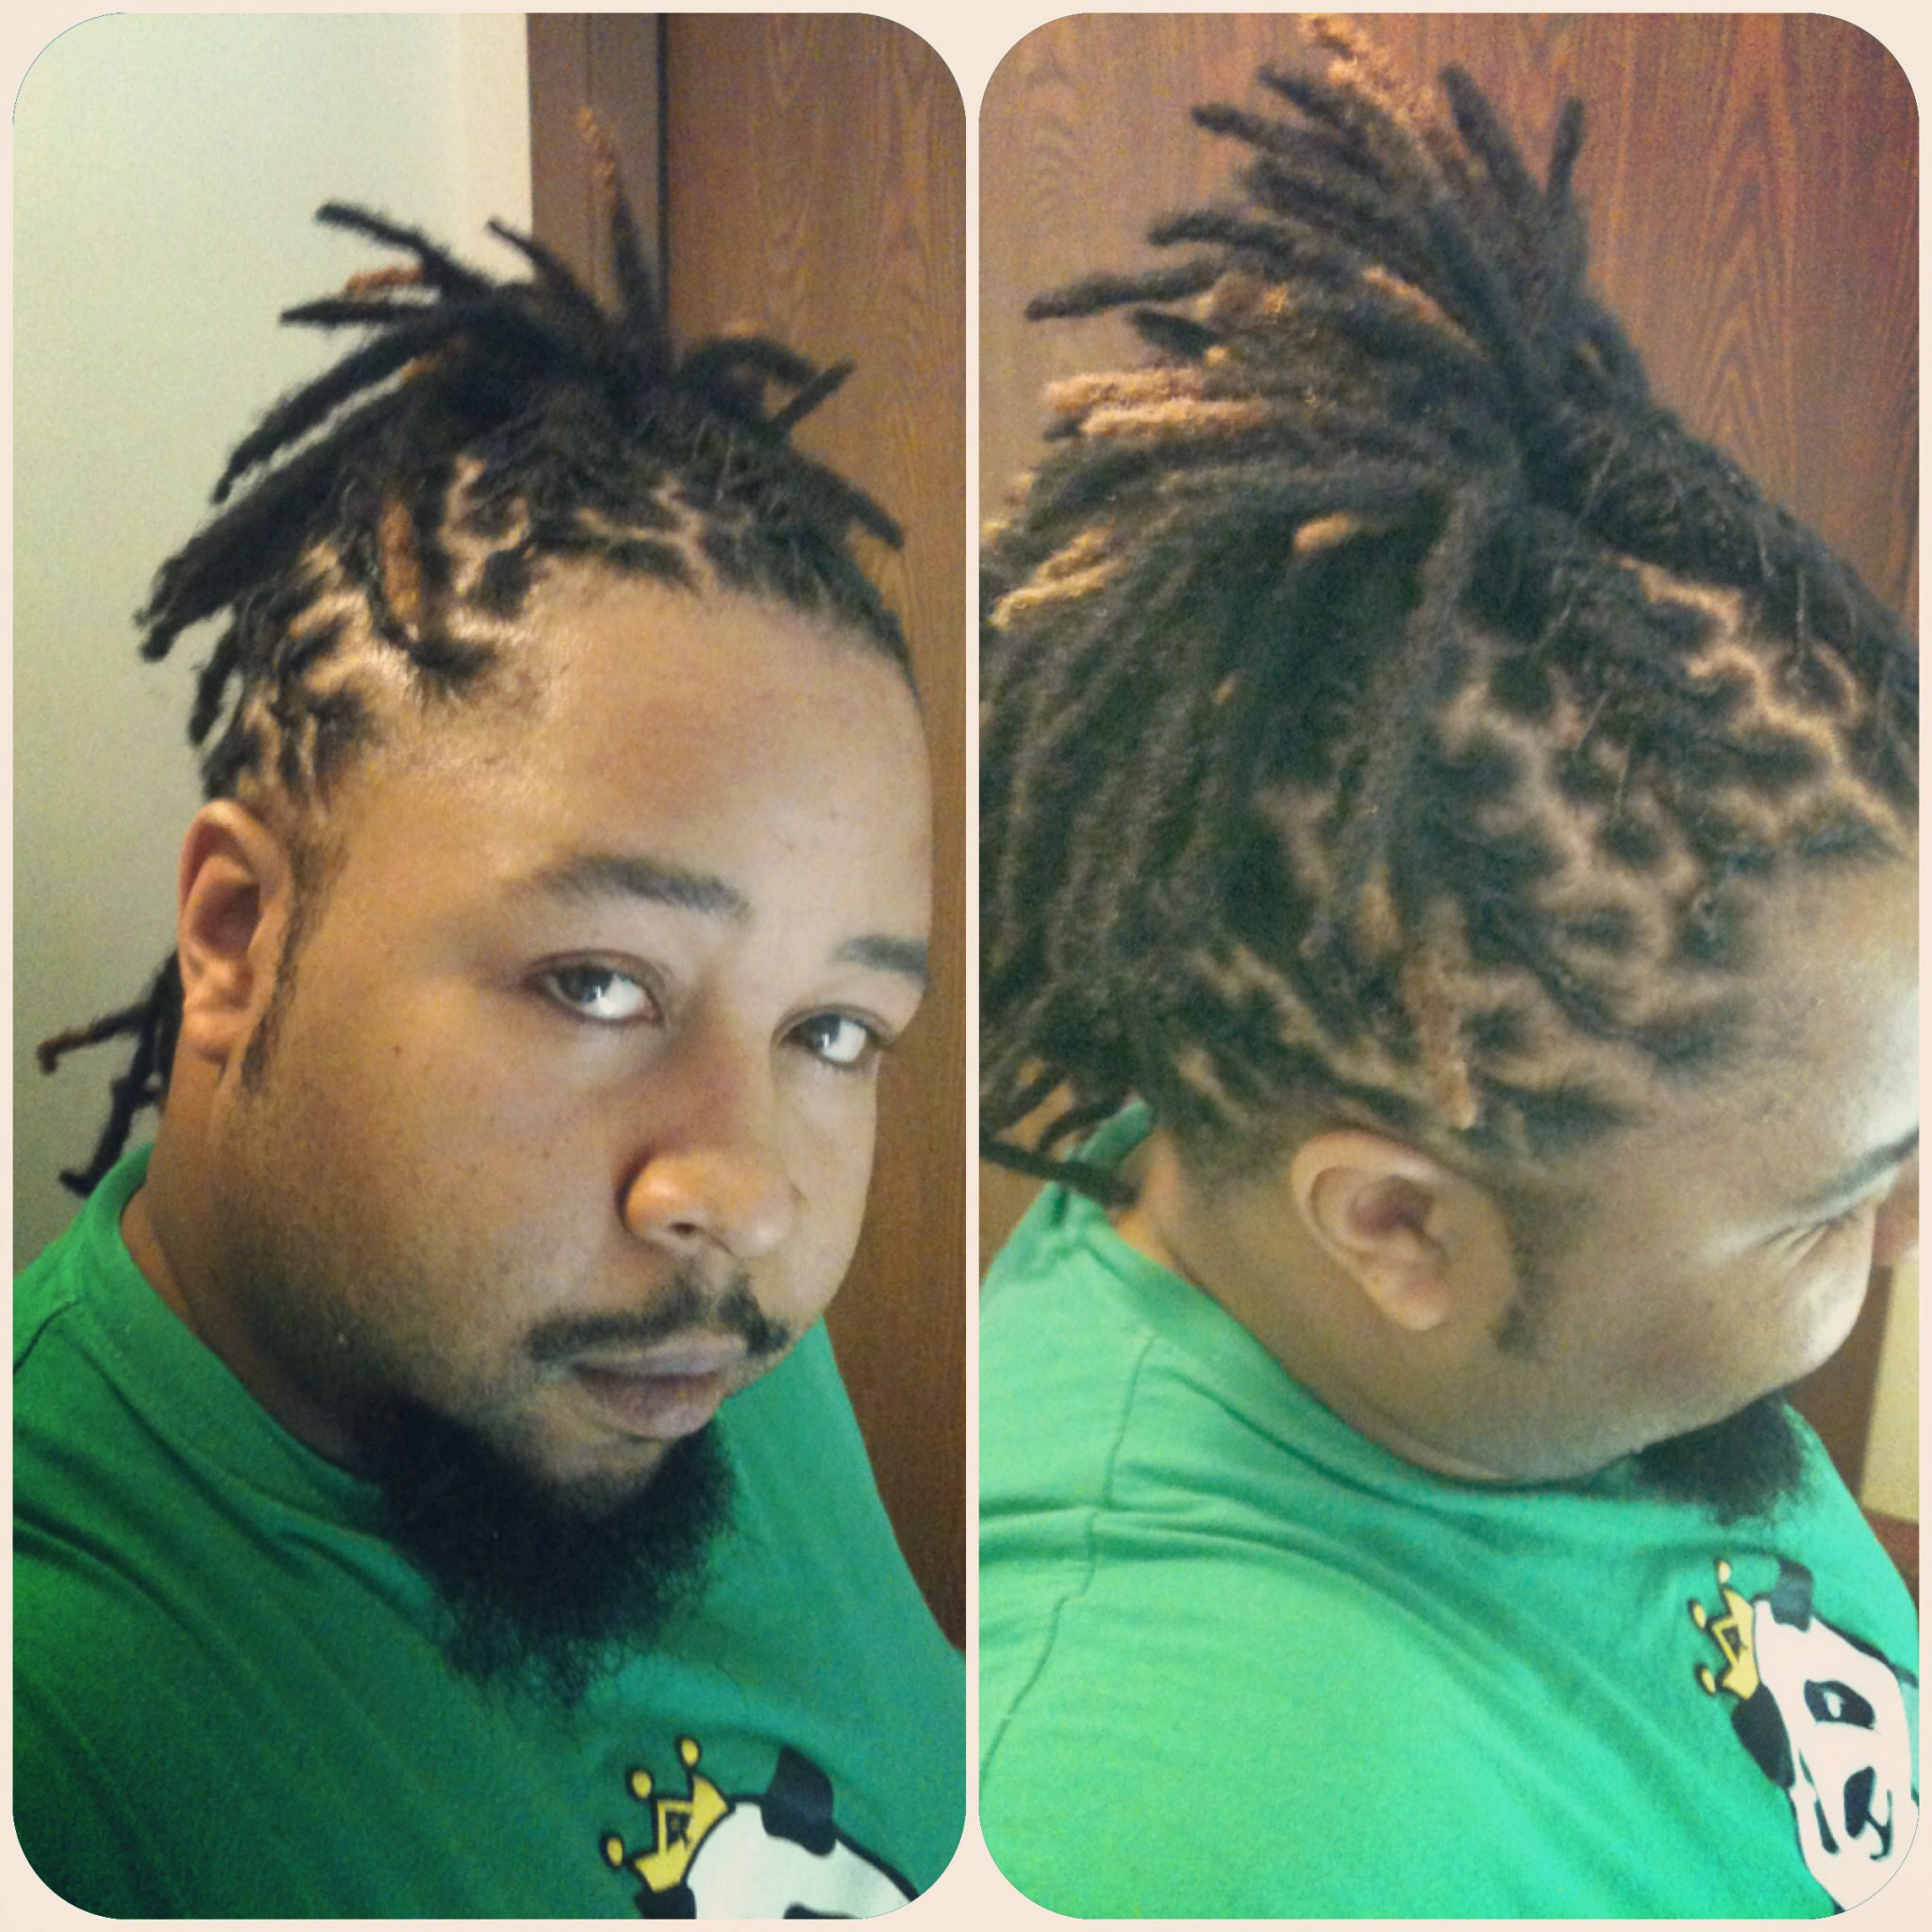 dreadhawk #dreadlocs #mohawk #dreads #locs #naturalstyles #braids